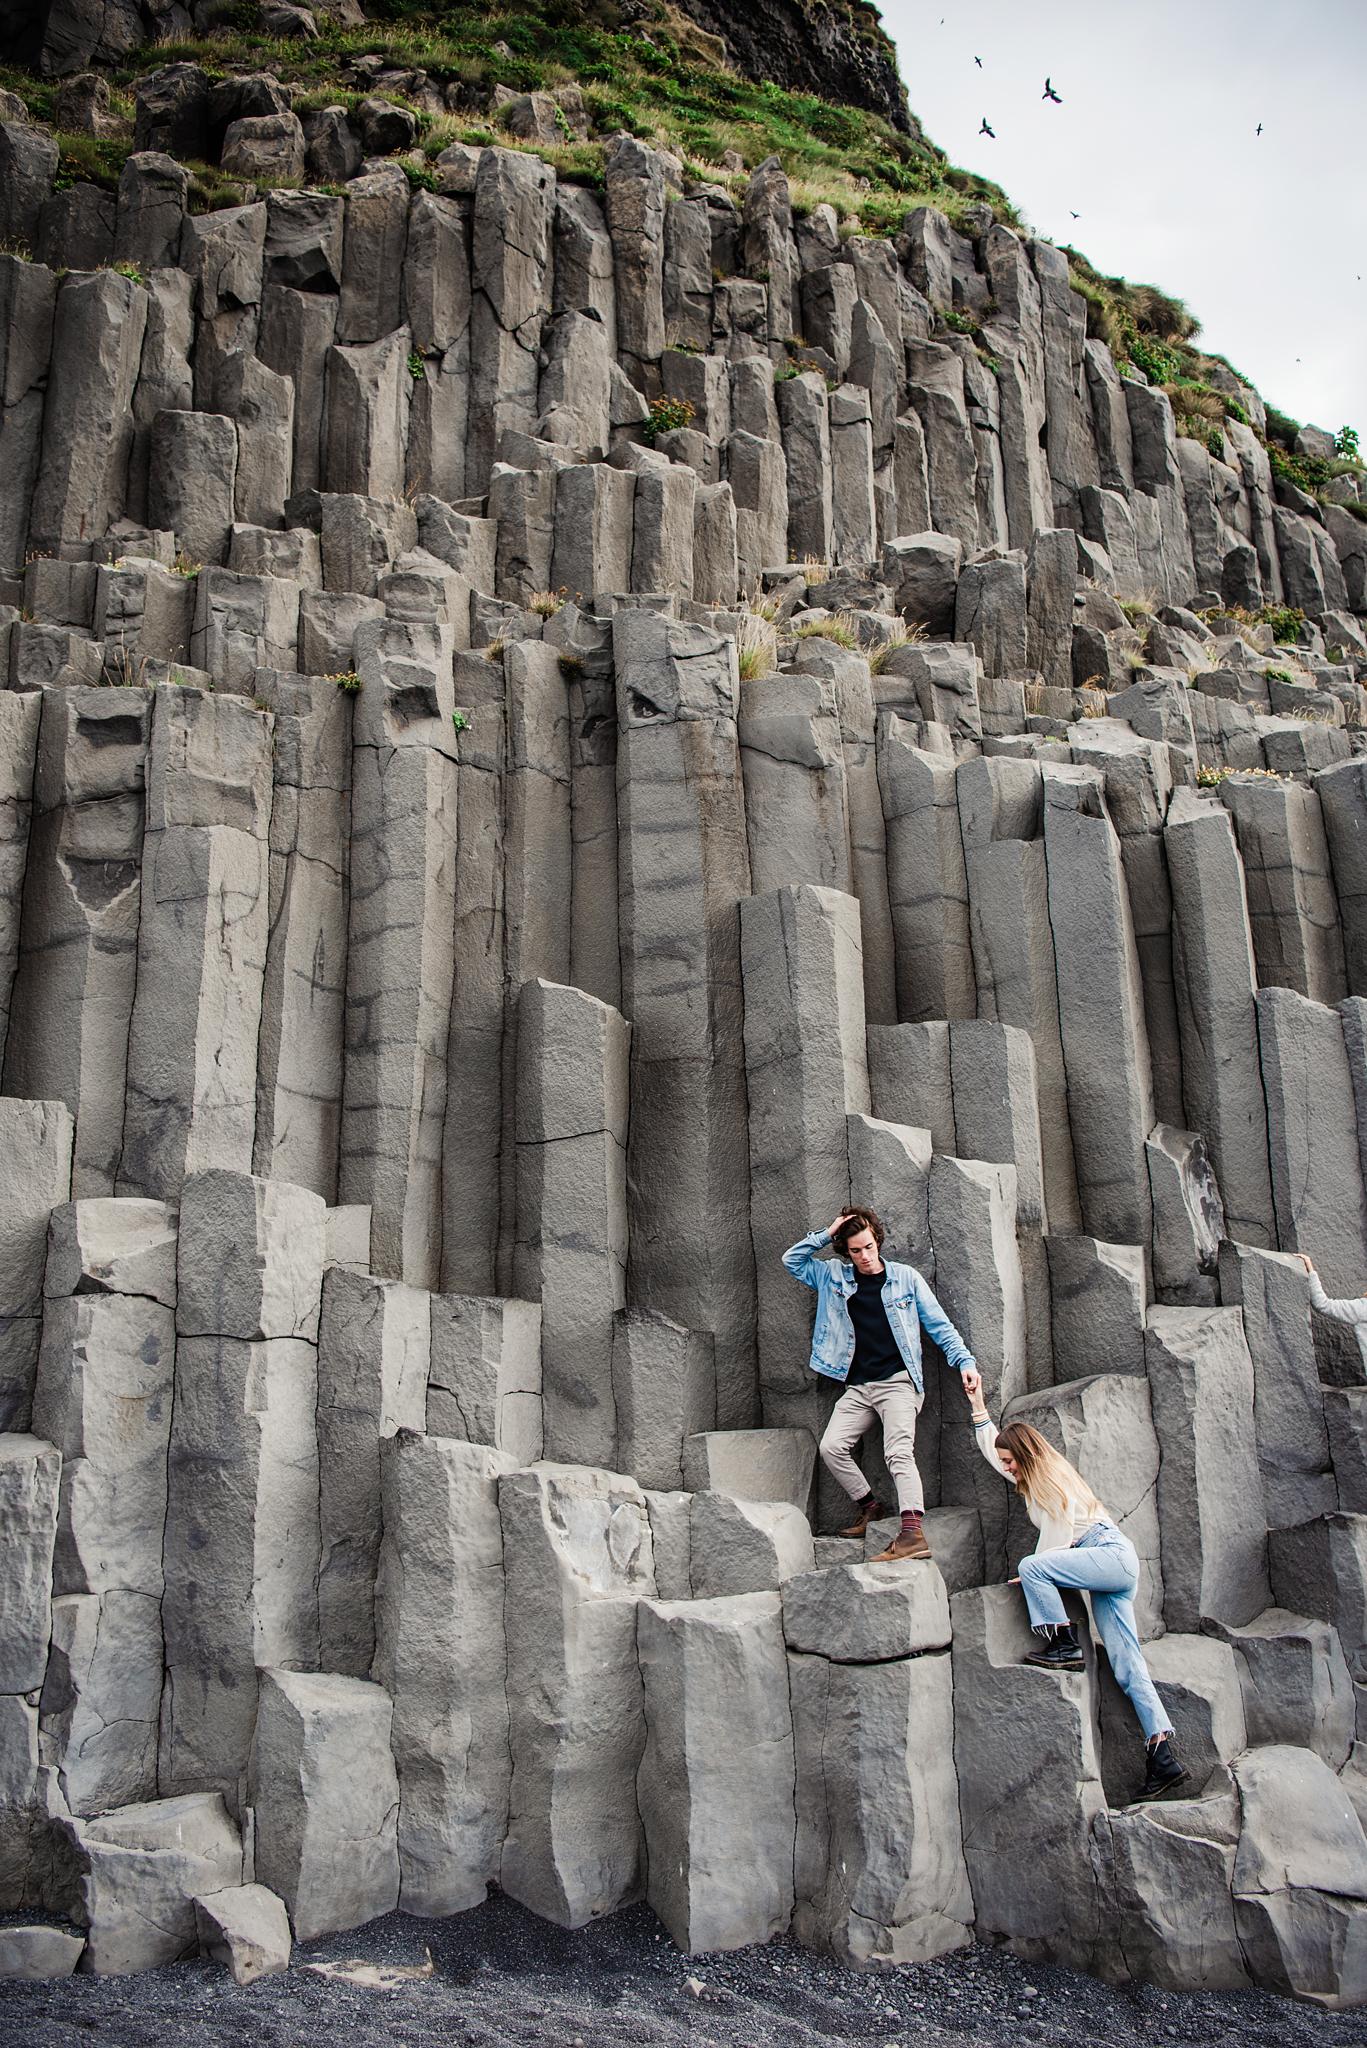 Iceland_Reynisfjara_Black_Sand_Beach_Couples_Session_JILL_STUDIO_Rochester_NY_Photographer_DSC_9749.jpg